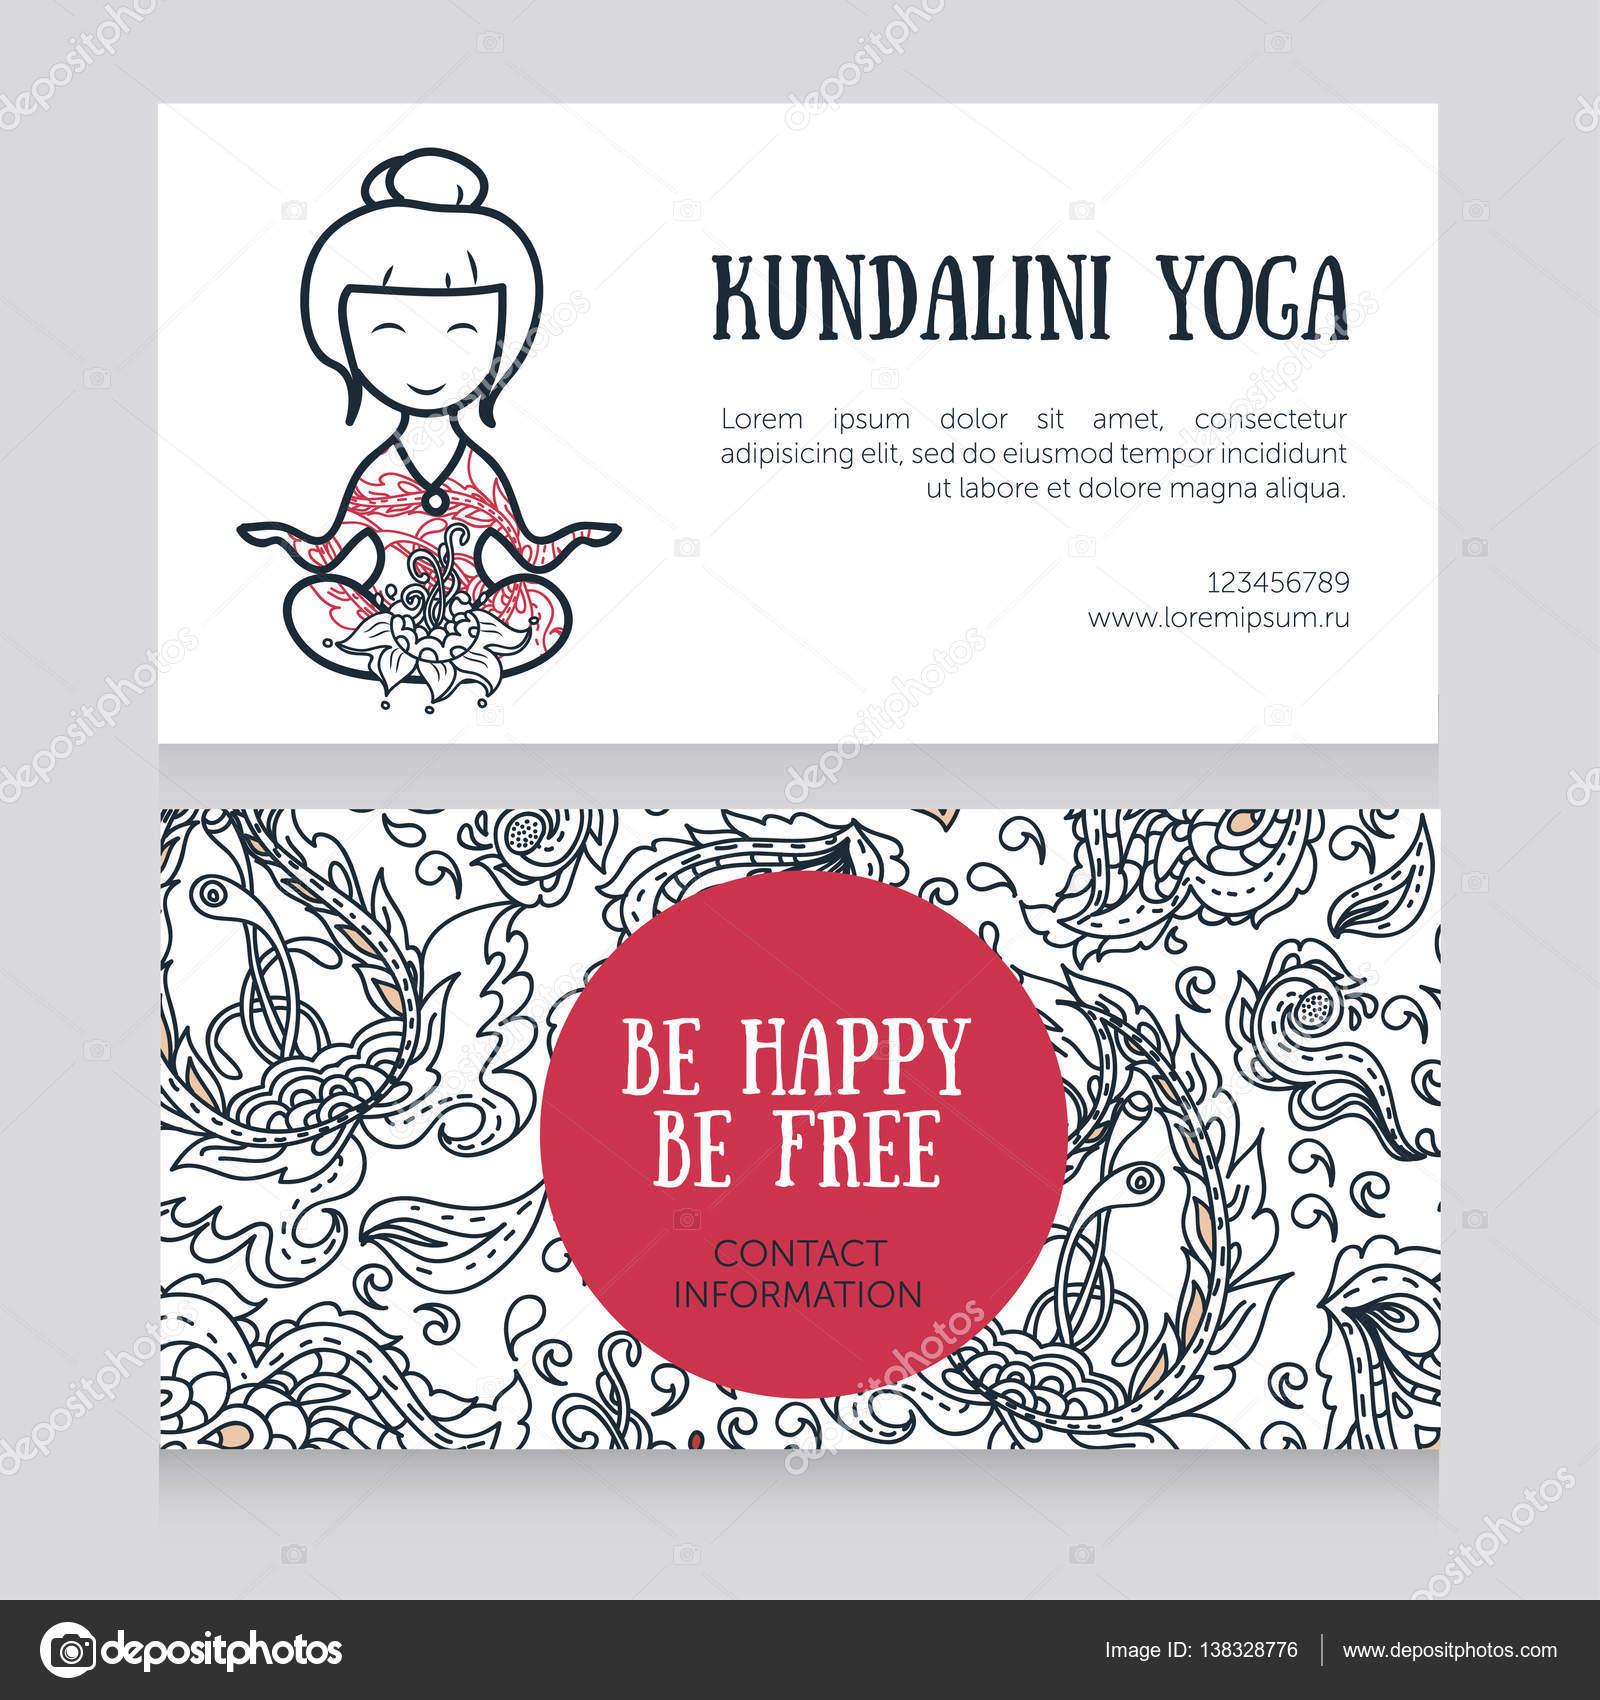 Karten Vorlage für Yoga-studio — Stockvektor © ghouliirina #138328776